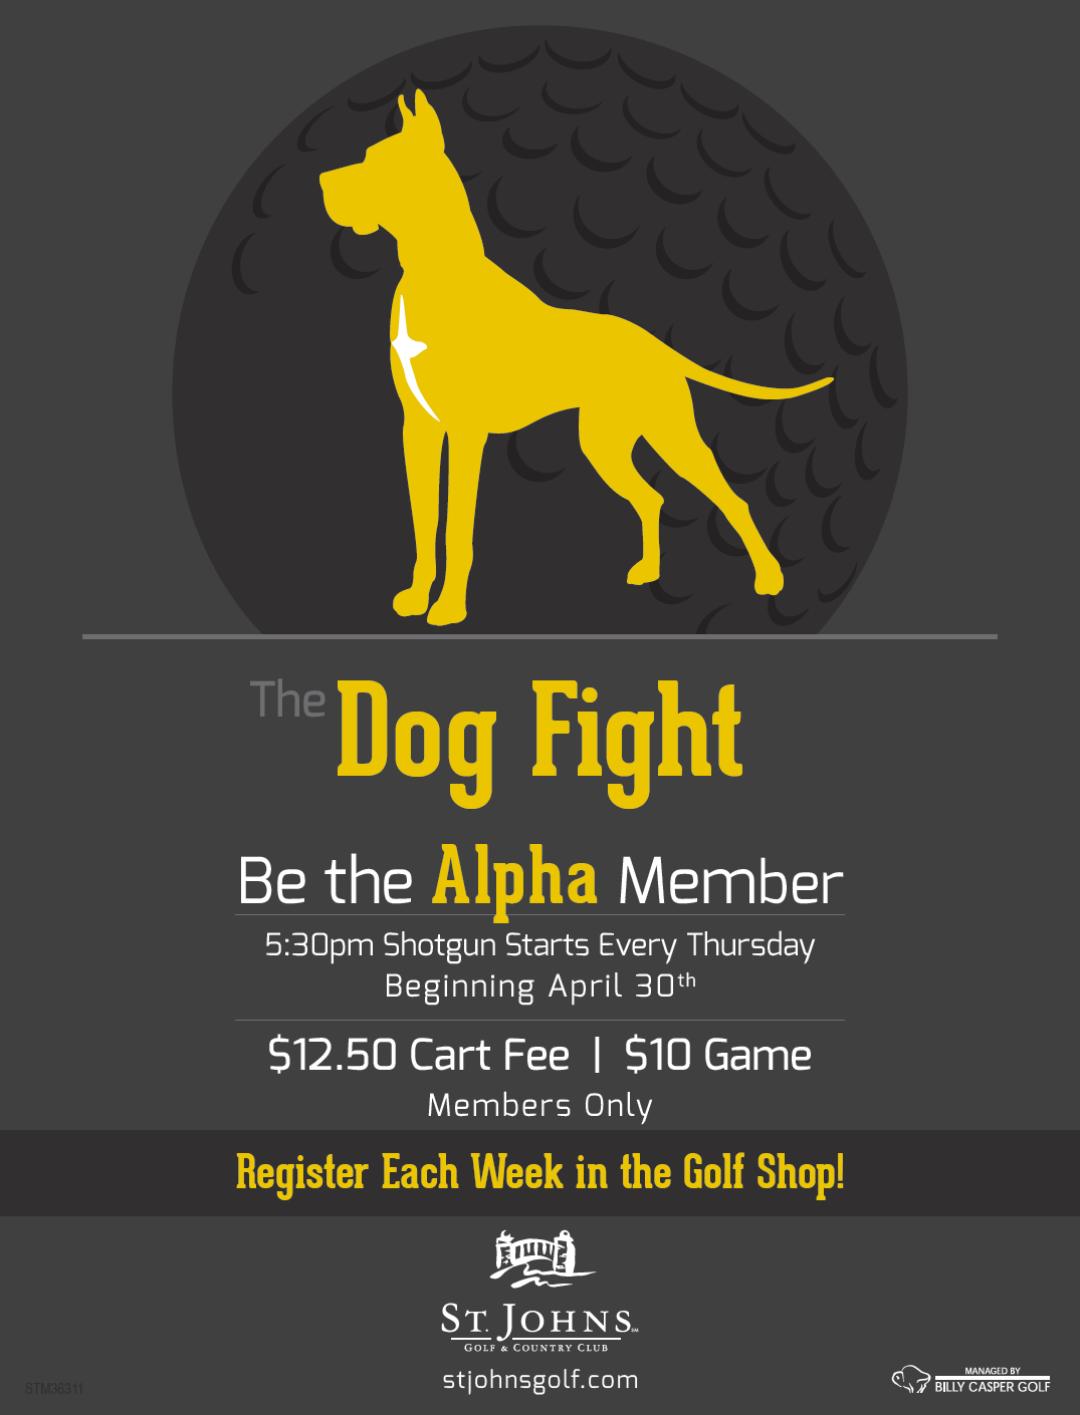 Dogfight 2015